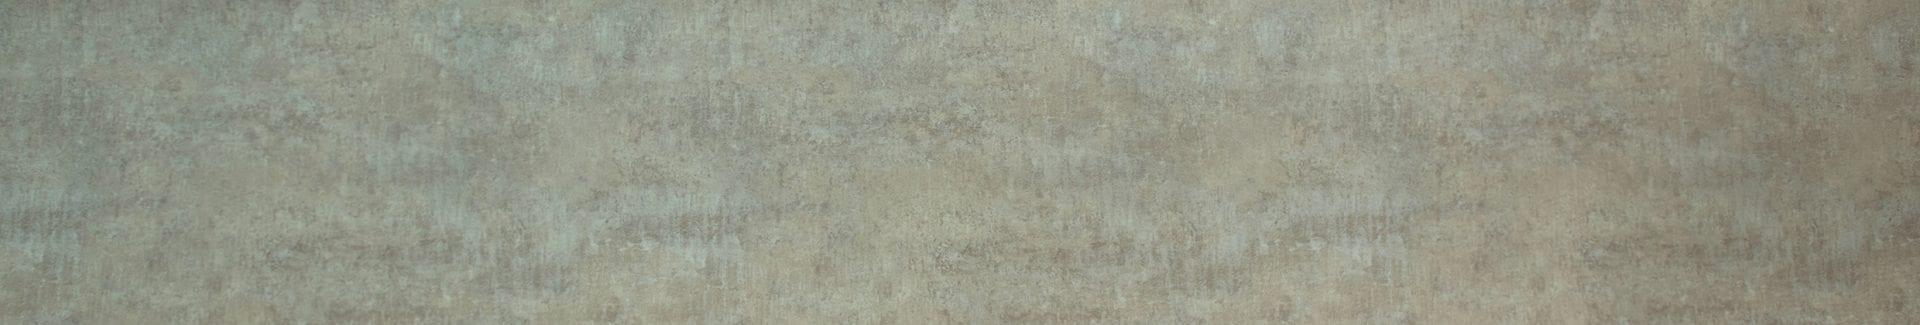 Fossil Grey Full Length Laminate Worktop by Topform